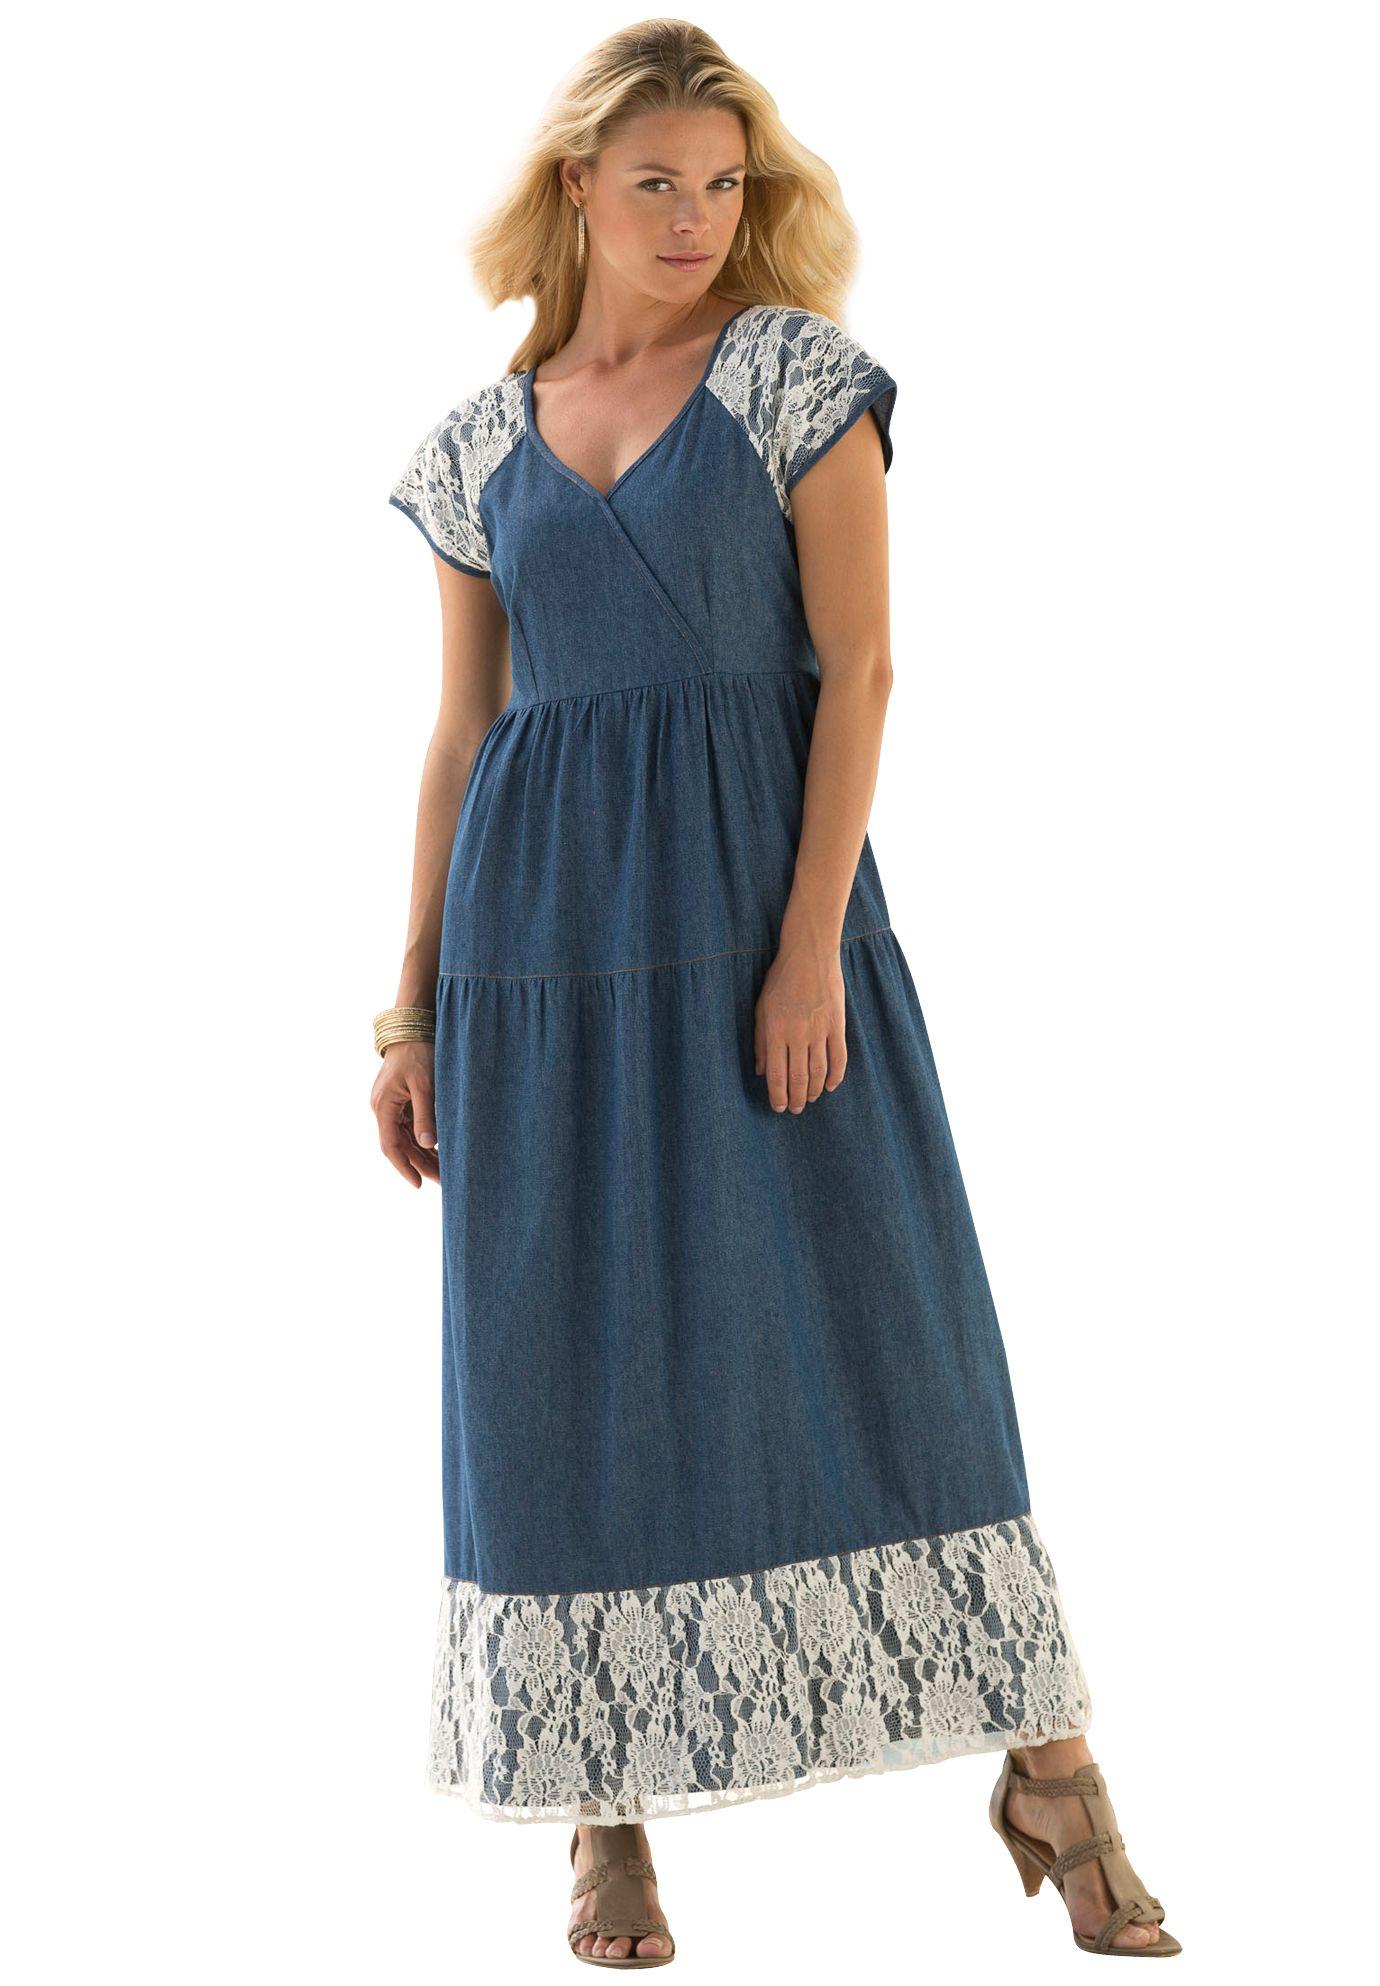 Denim Crochet Maxi Dress By Denim 24 7 Lace Dress With Sleeves Plus Size Outfits Maxi Dress [ 1986 x 1380 Pixel ]